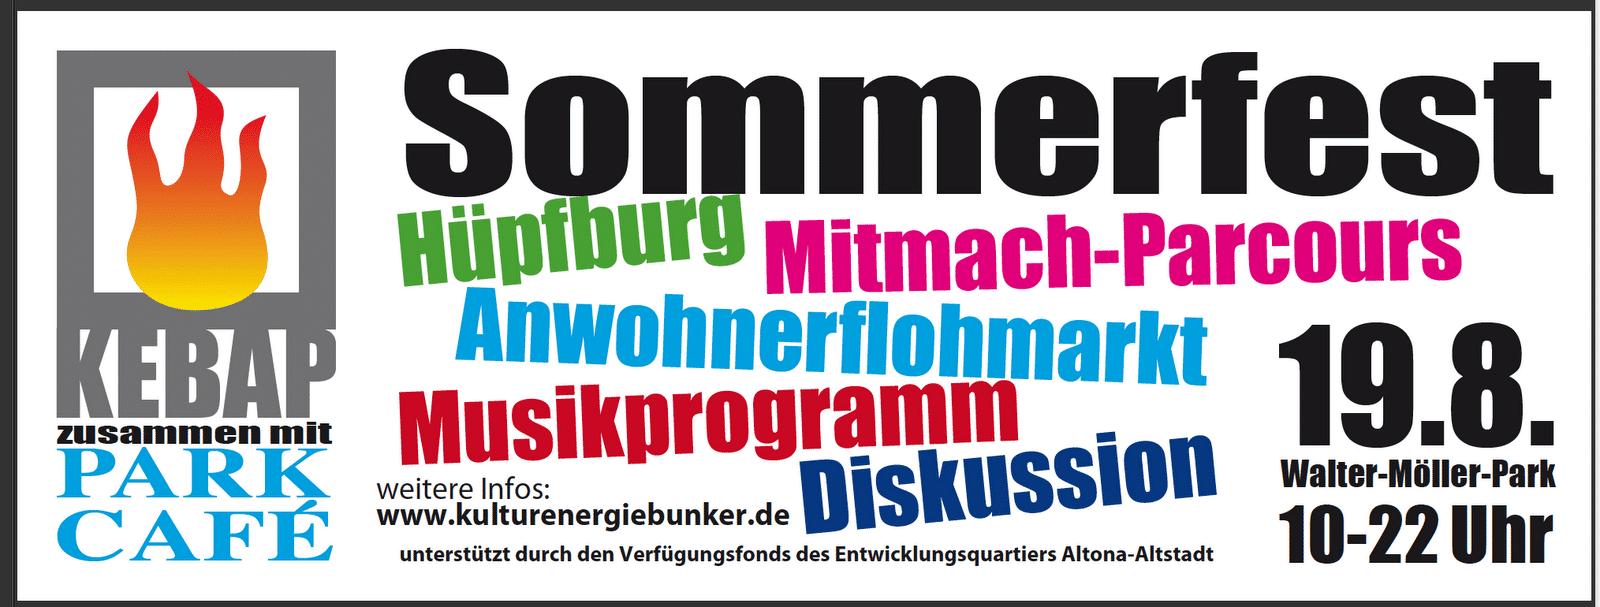 Sommerfest in Altona im Walter-Möller-Park